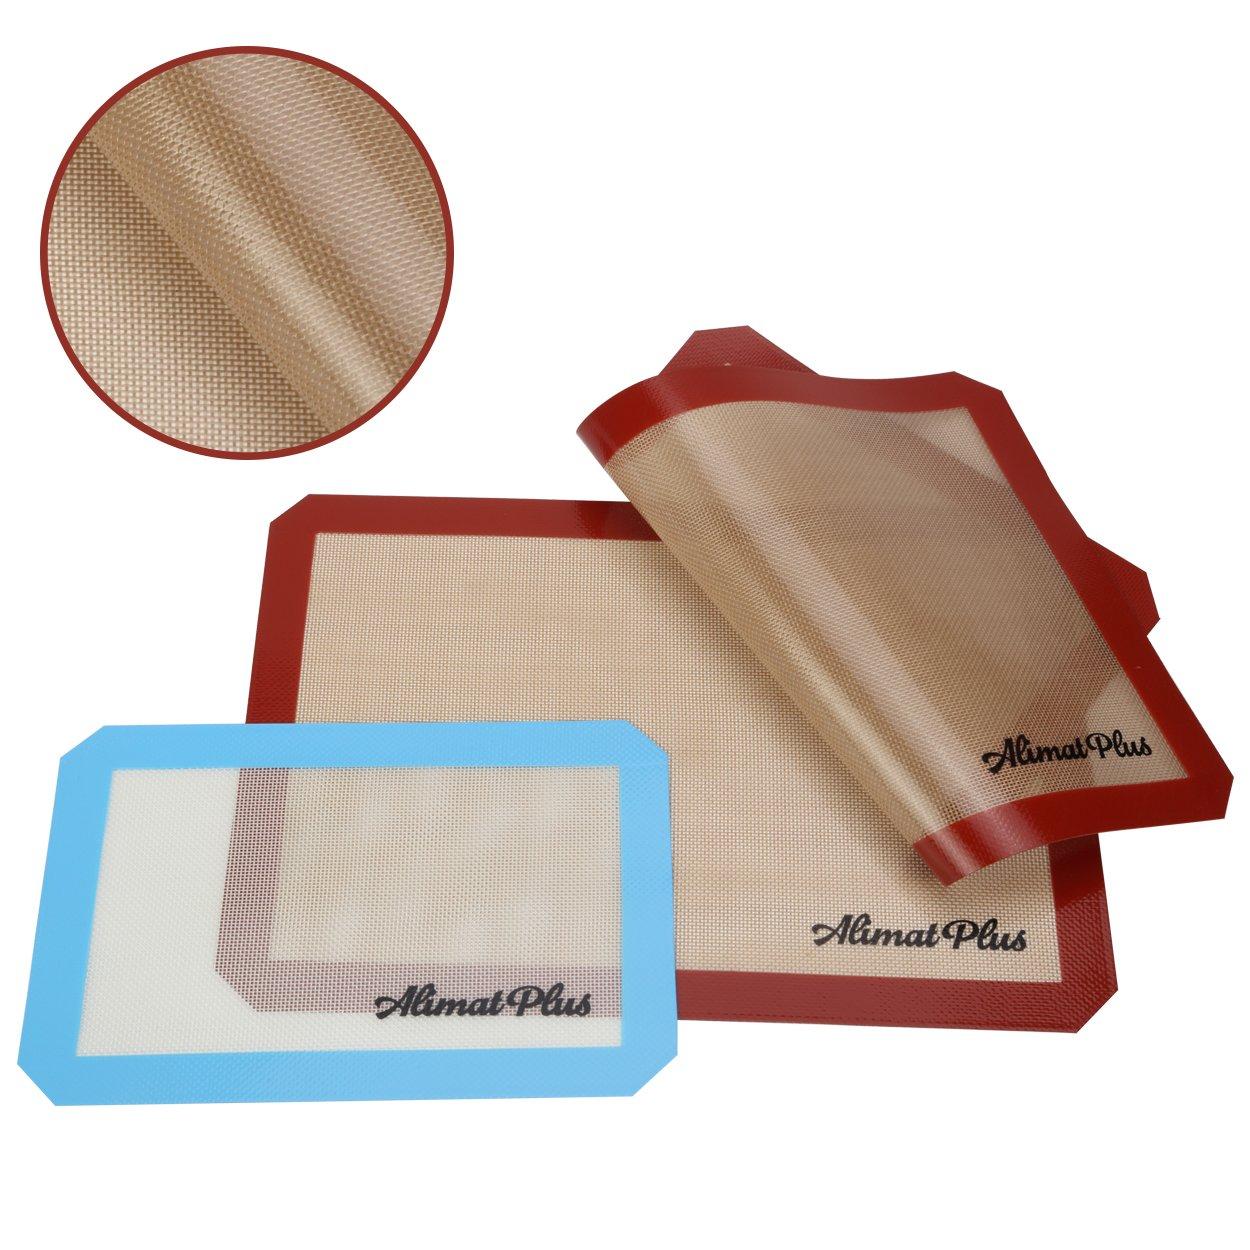 Alimat Plus Silicon Baking mat Cookie Sheet Non Stick Dishwasher Safe Reusable by Alimat Plus (Image #4)